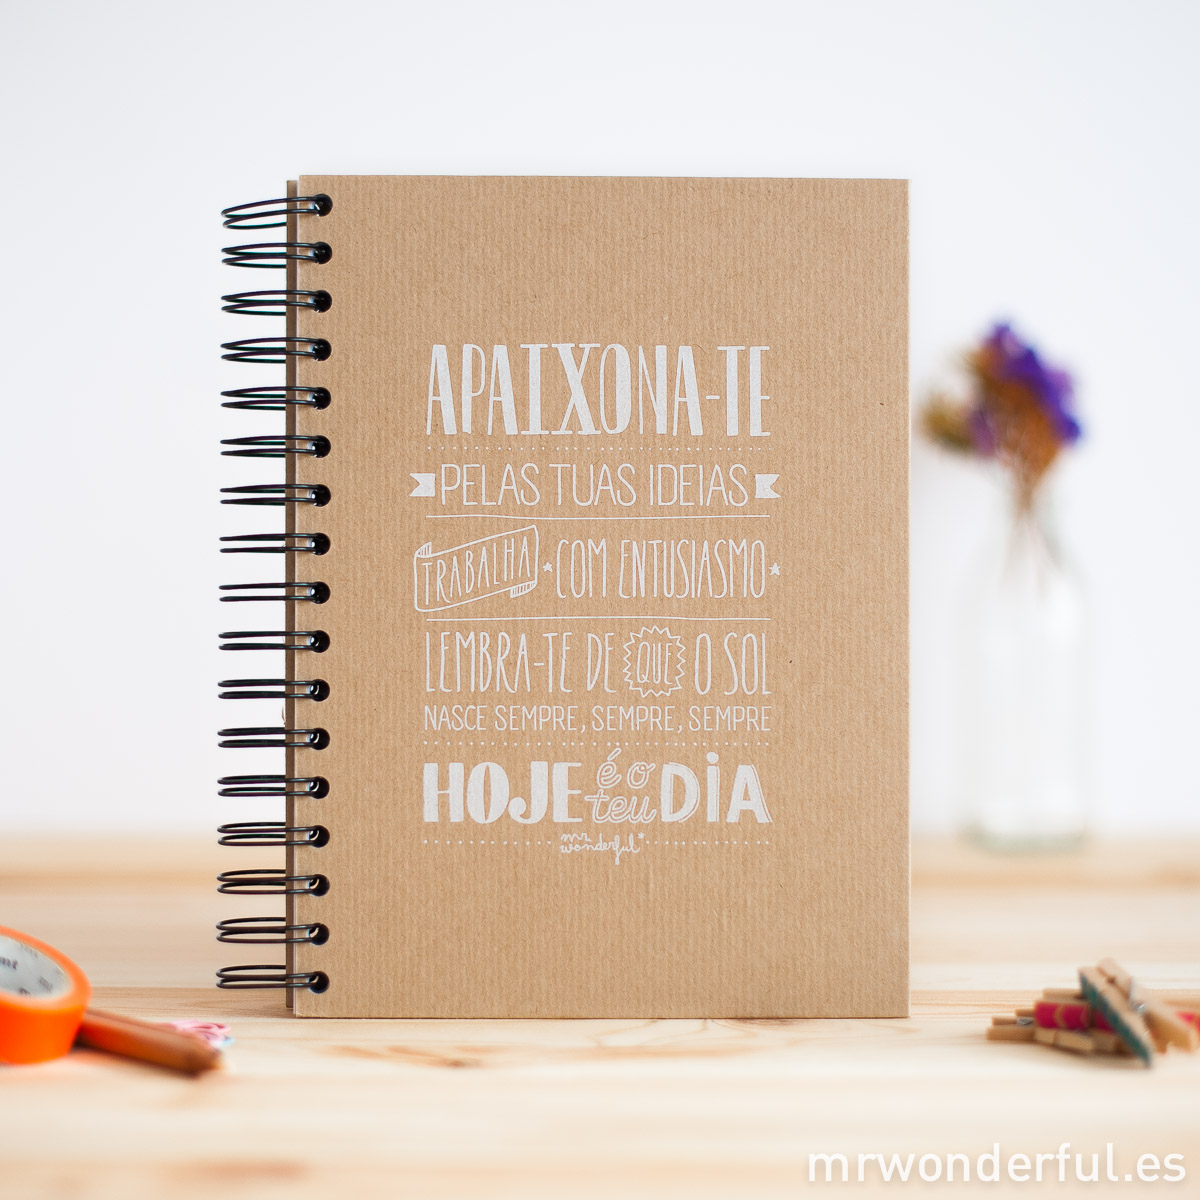 rwonderful_lib19a_libreta-craft_apaixonate-pelas-tuas-ideas-1